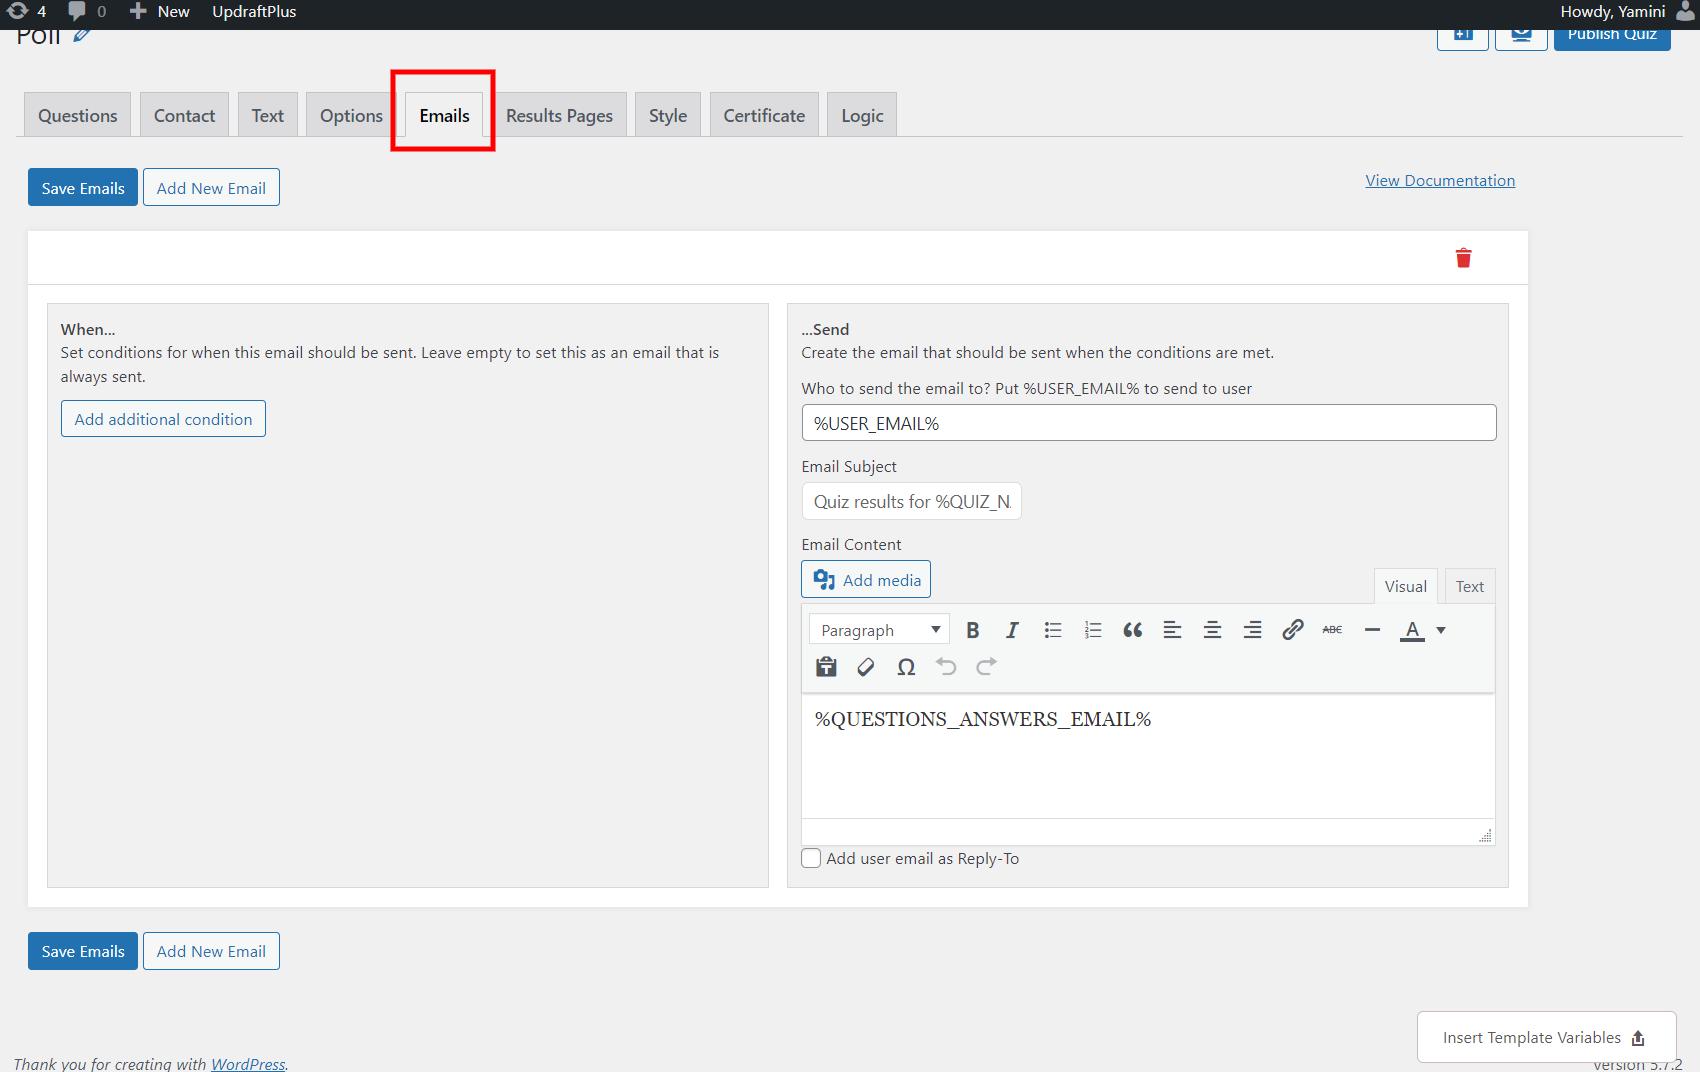 Best WordPress Poll Plugin - Edit emails